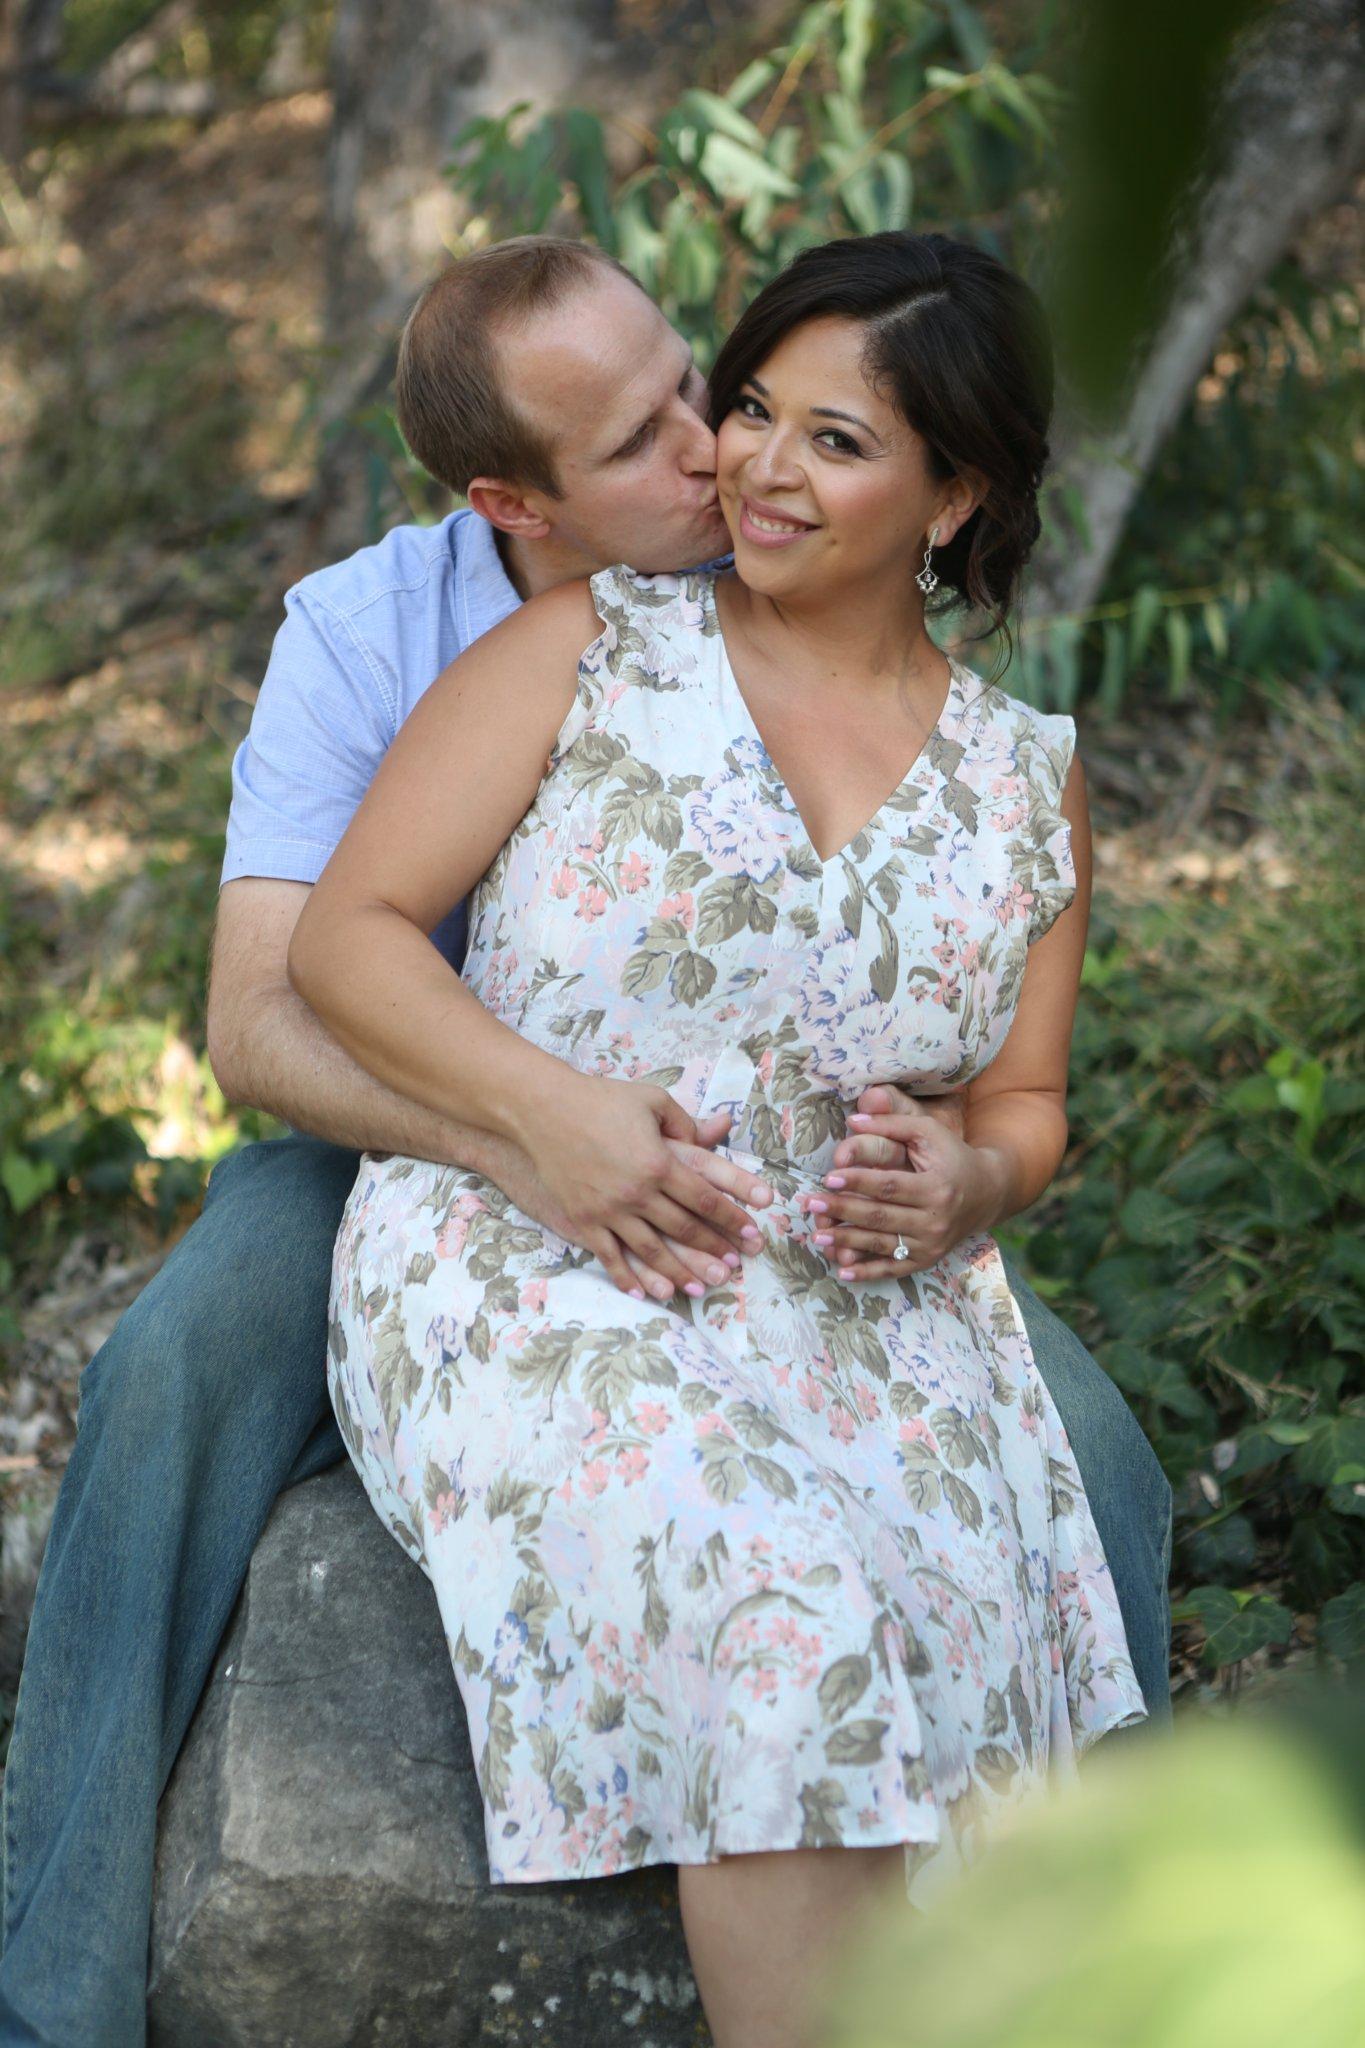 Jason and Perla Engagement Shoot Jared Sislin Photography 321